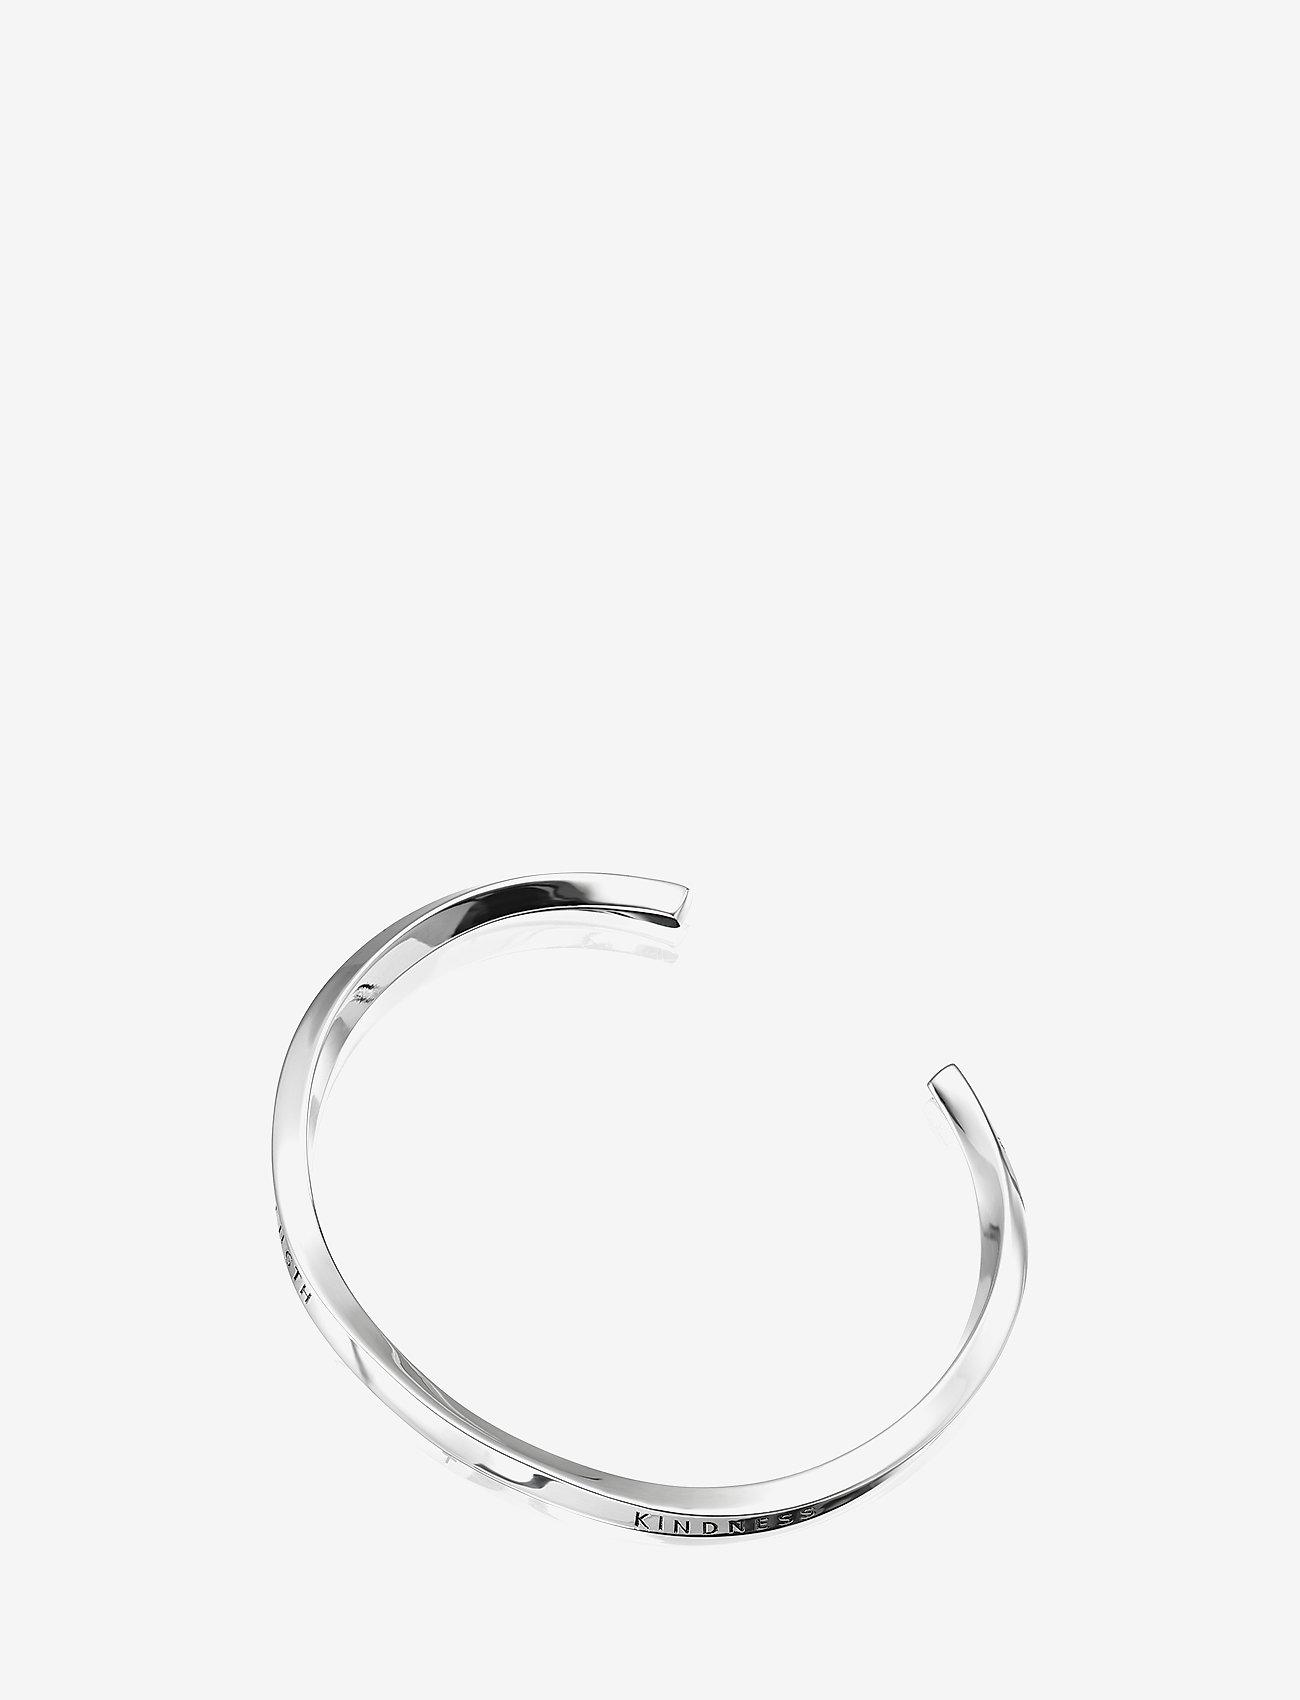 Efva Attling - Strength & Kindness Slim Cuff - bangles - silver - 1